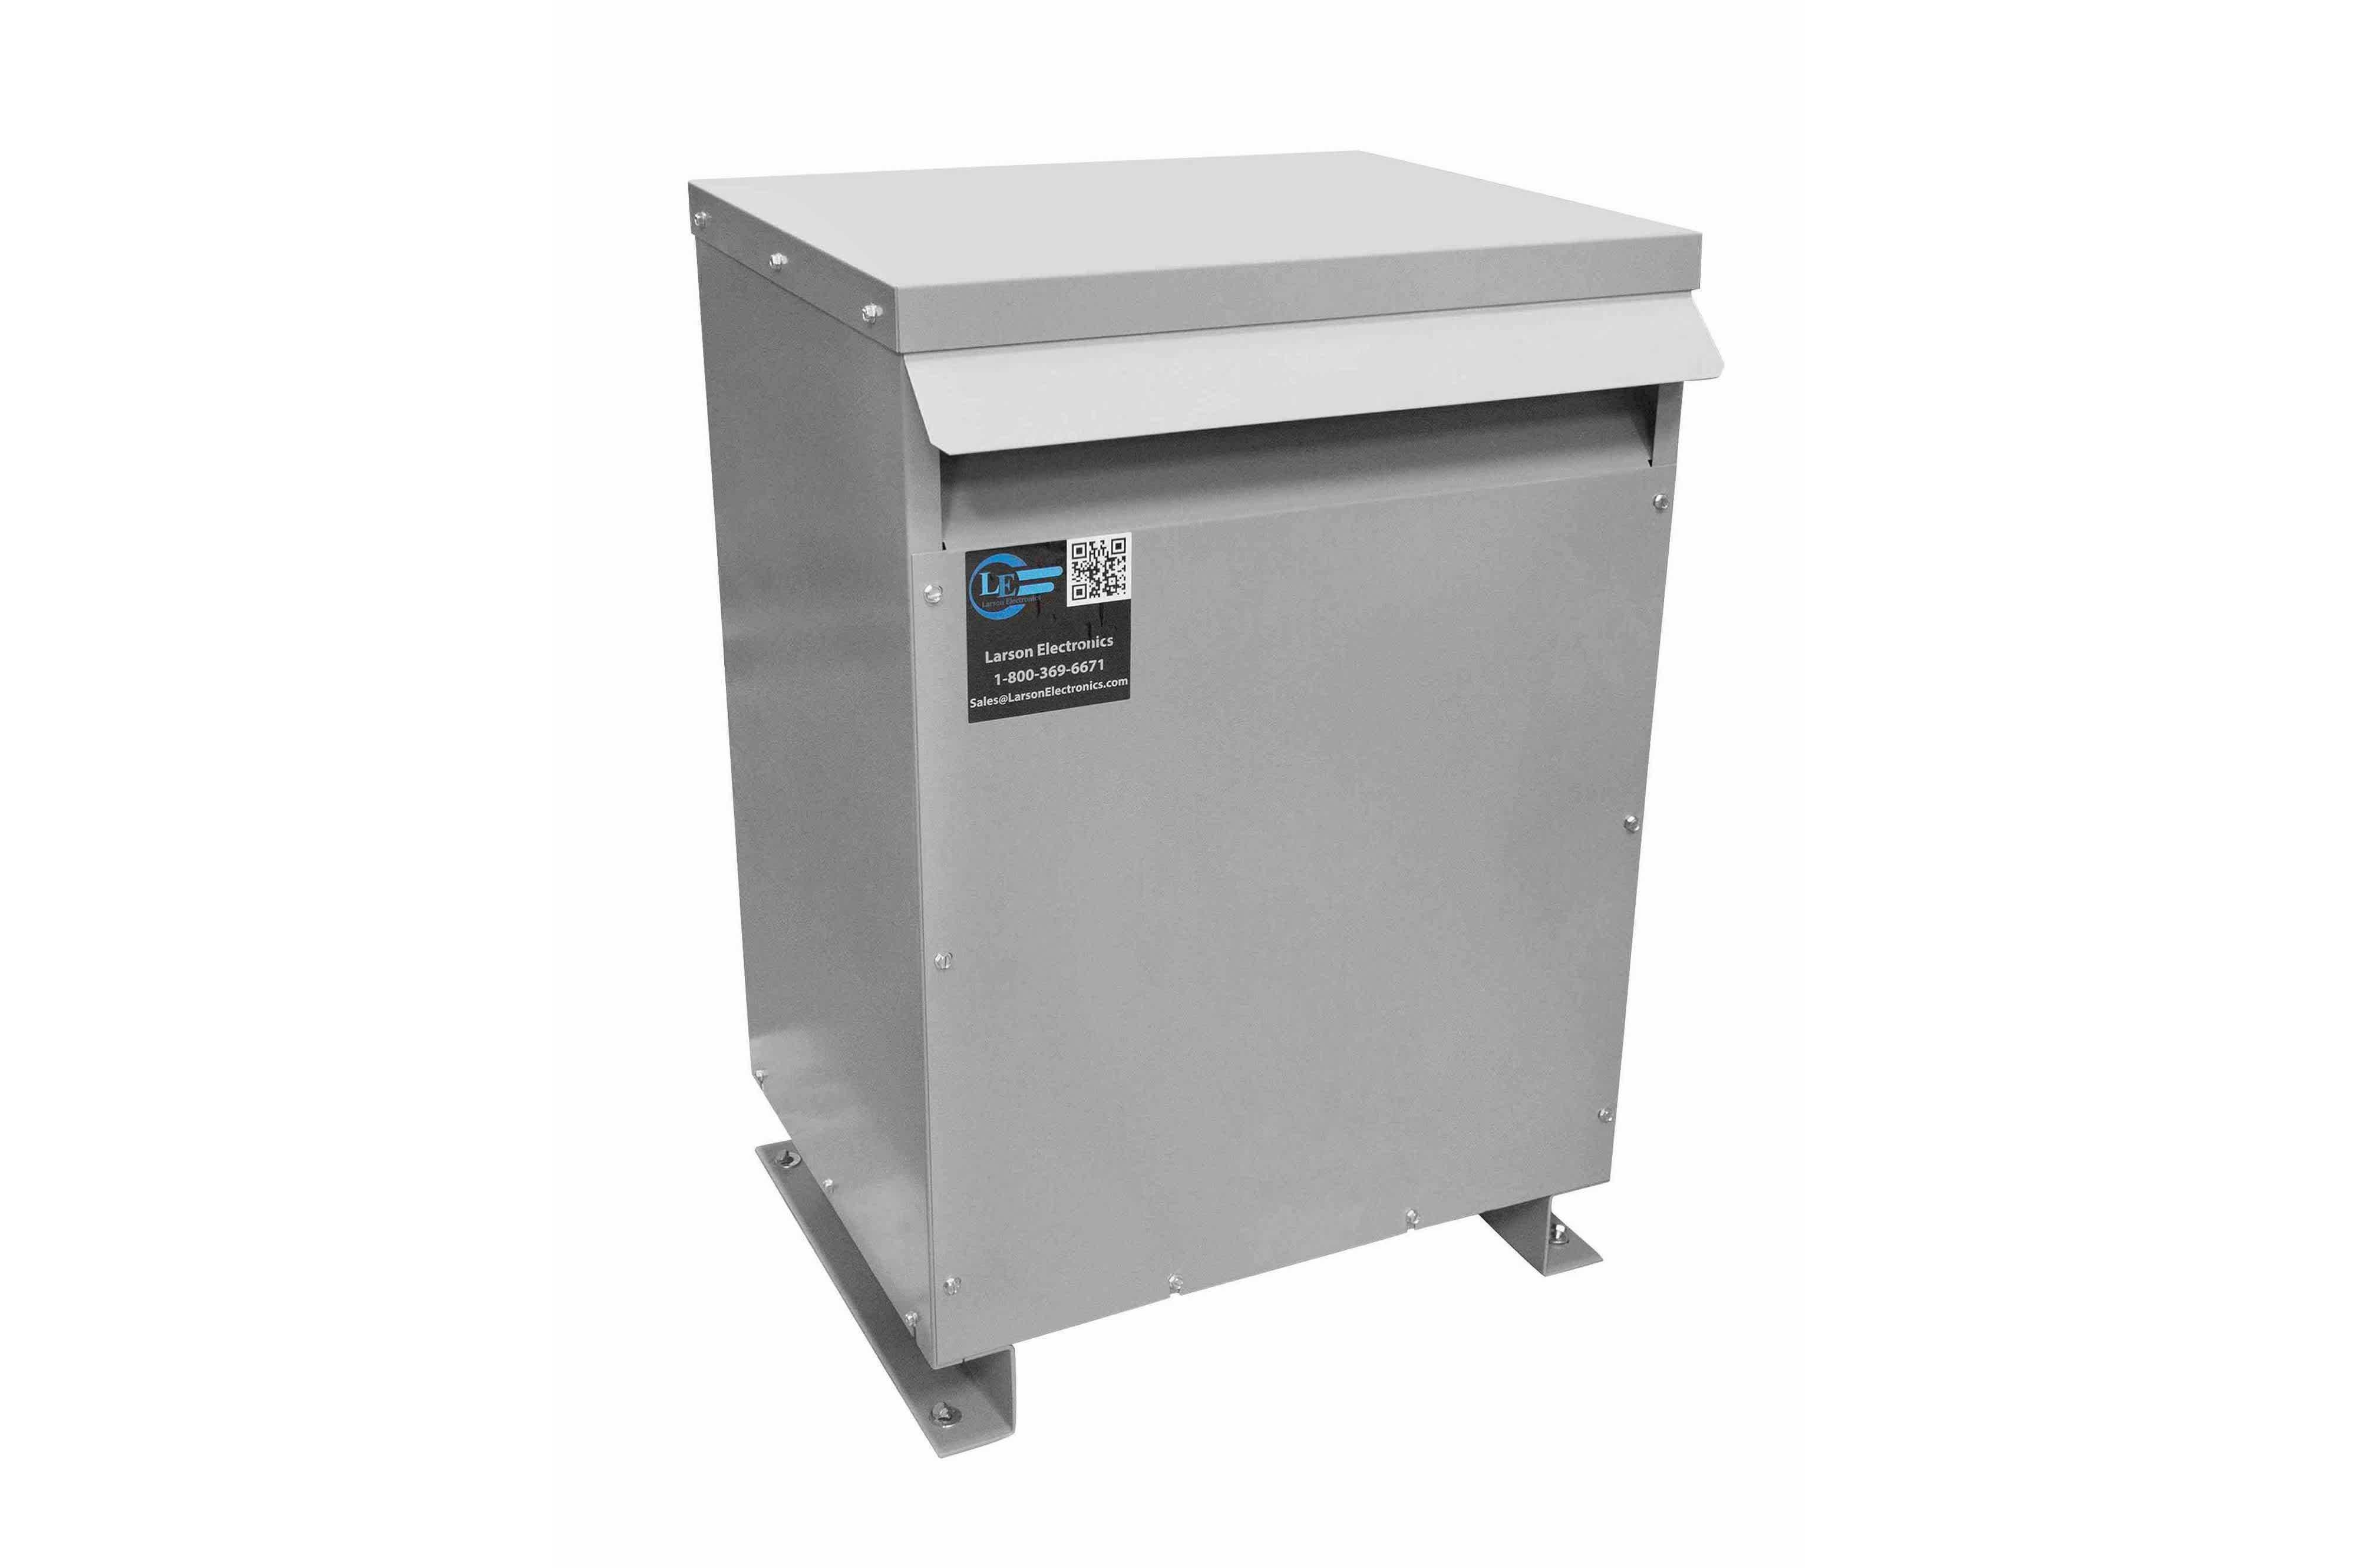 37.5 kVA 3PH DOE Transformer, 220V Delta Primary, 480Y/277 Wye-N Secondary, N3R, Ventilated, 60 Hz